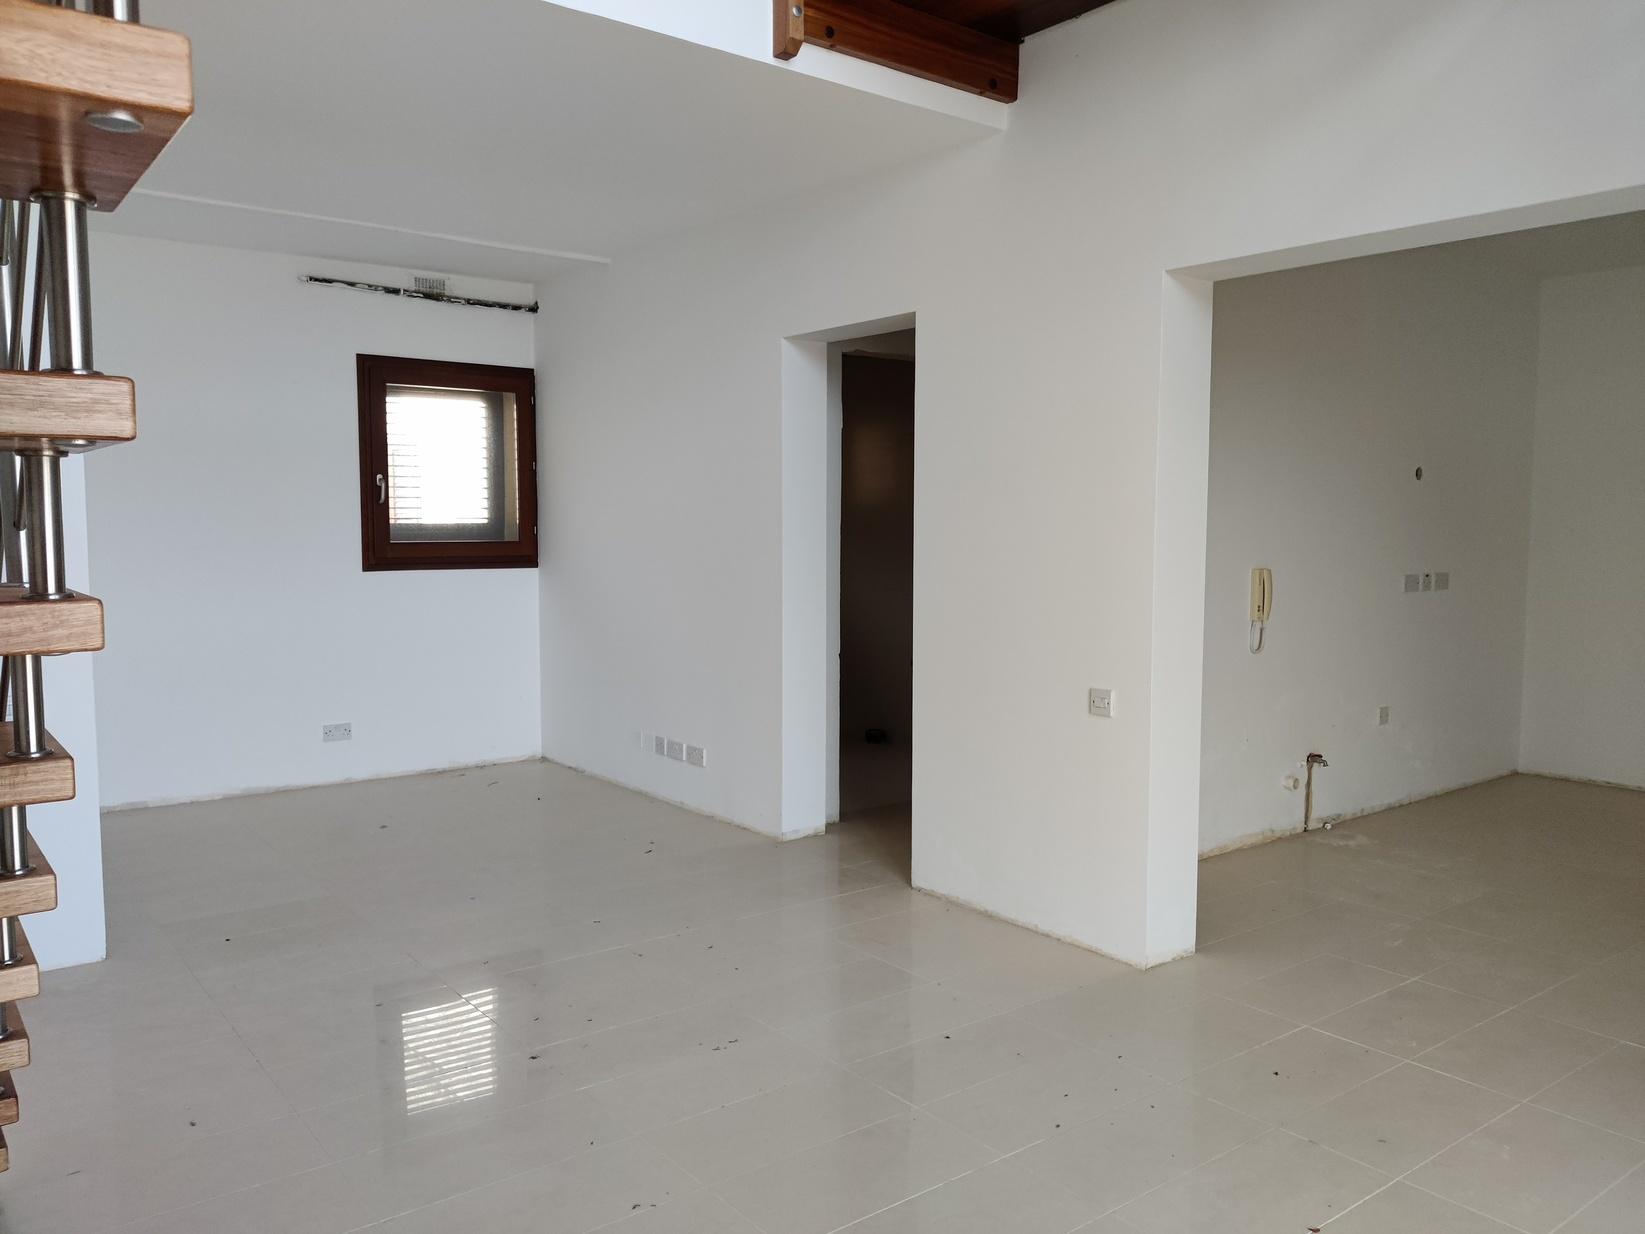 4 bed Villa For Sale in Ghajnsielem, Ghajnsielem - thumb 7